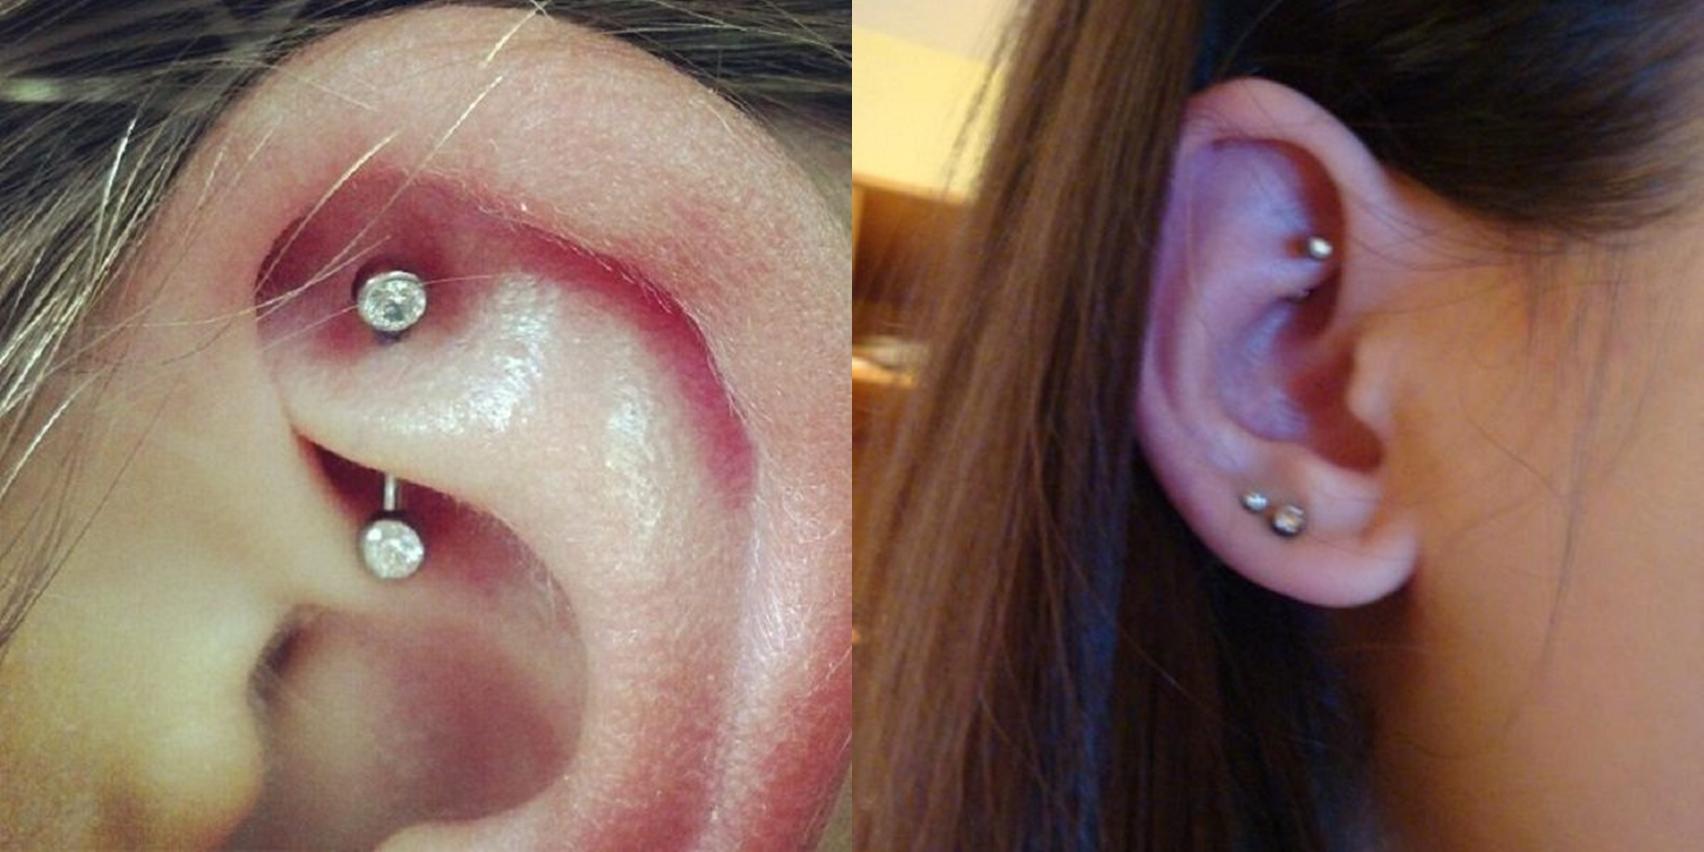 jewelry rook piercing